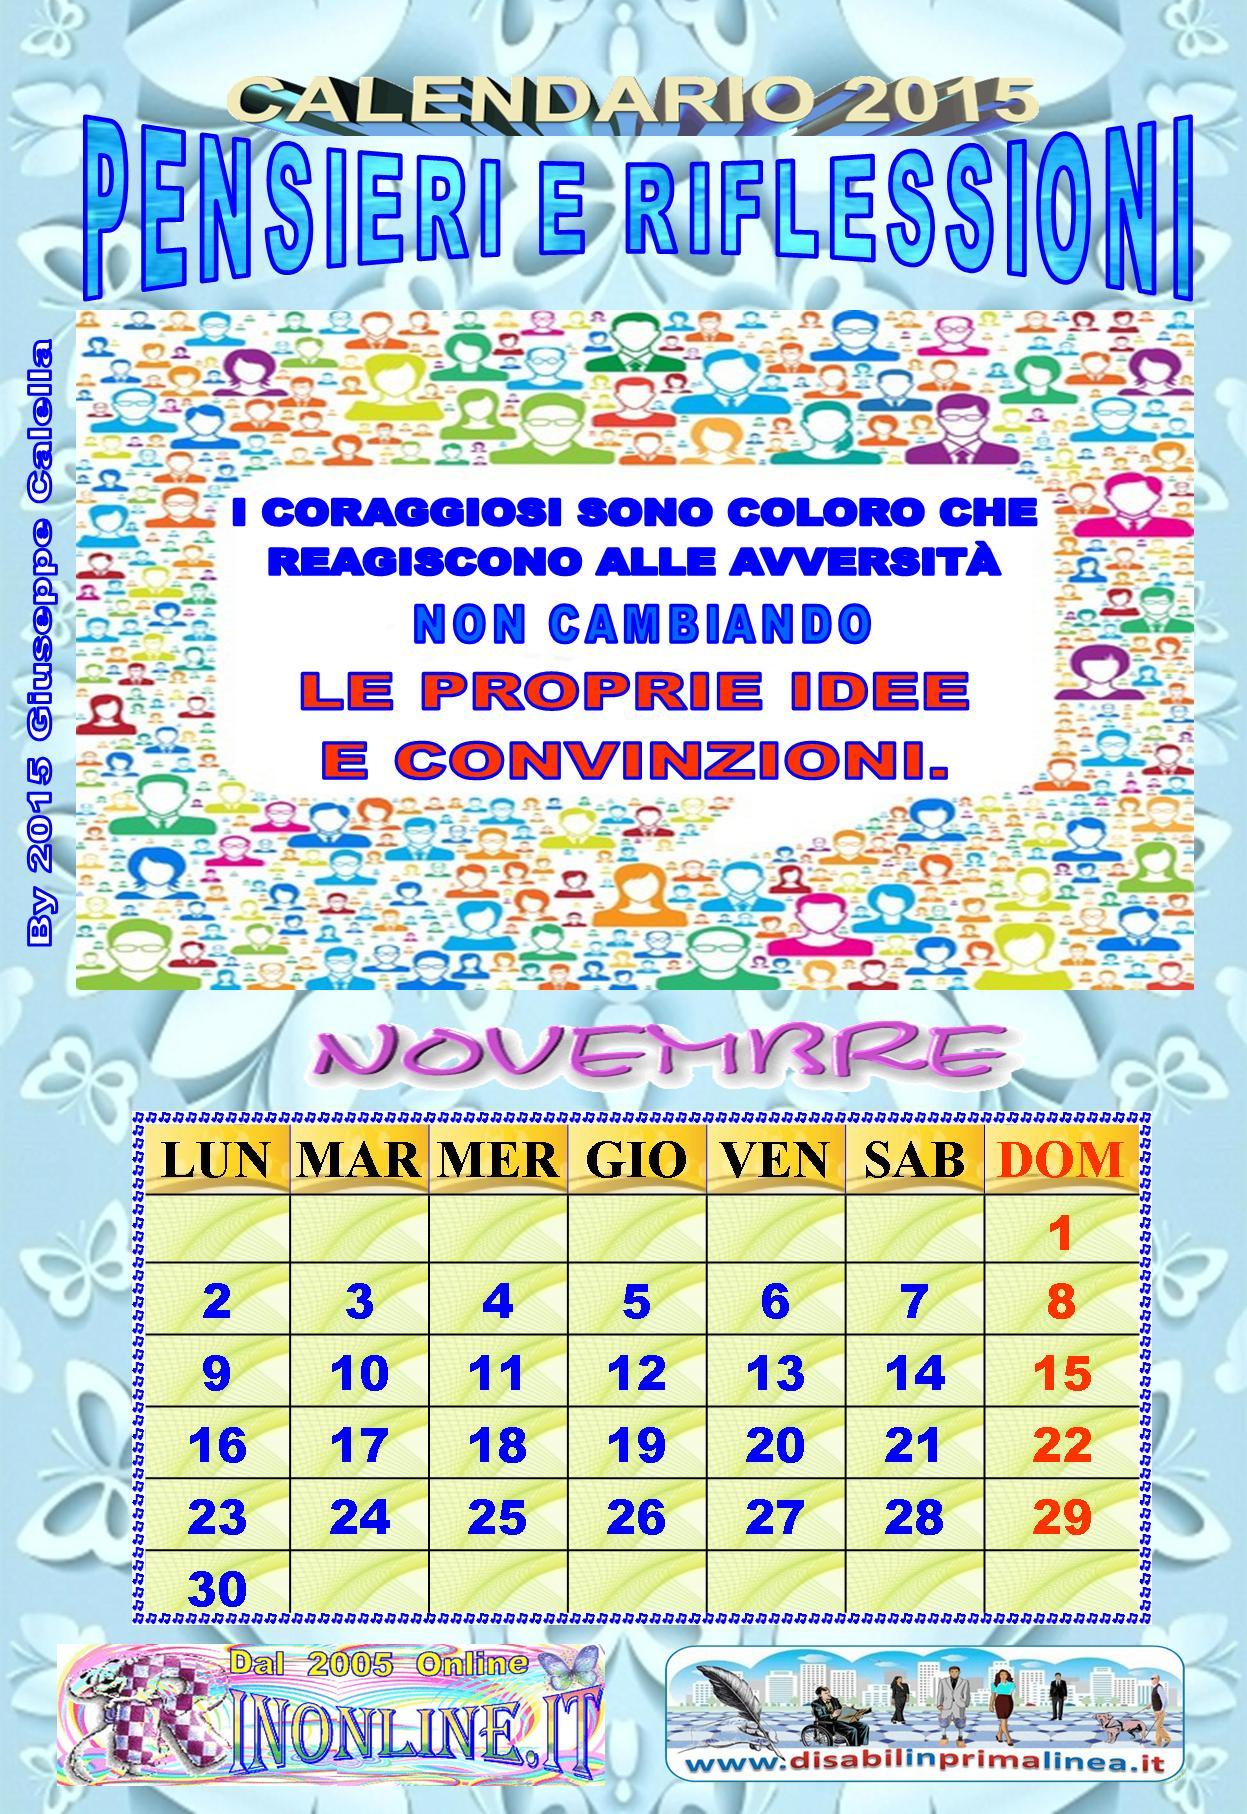 novembre_calendario_2015_pensieri_riflessioni_giuseppe_calella